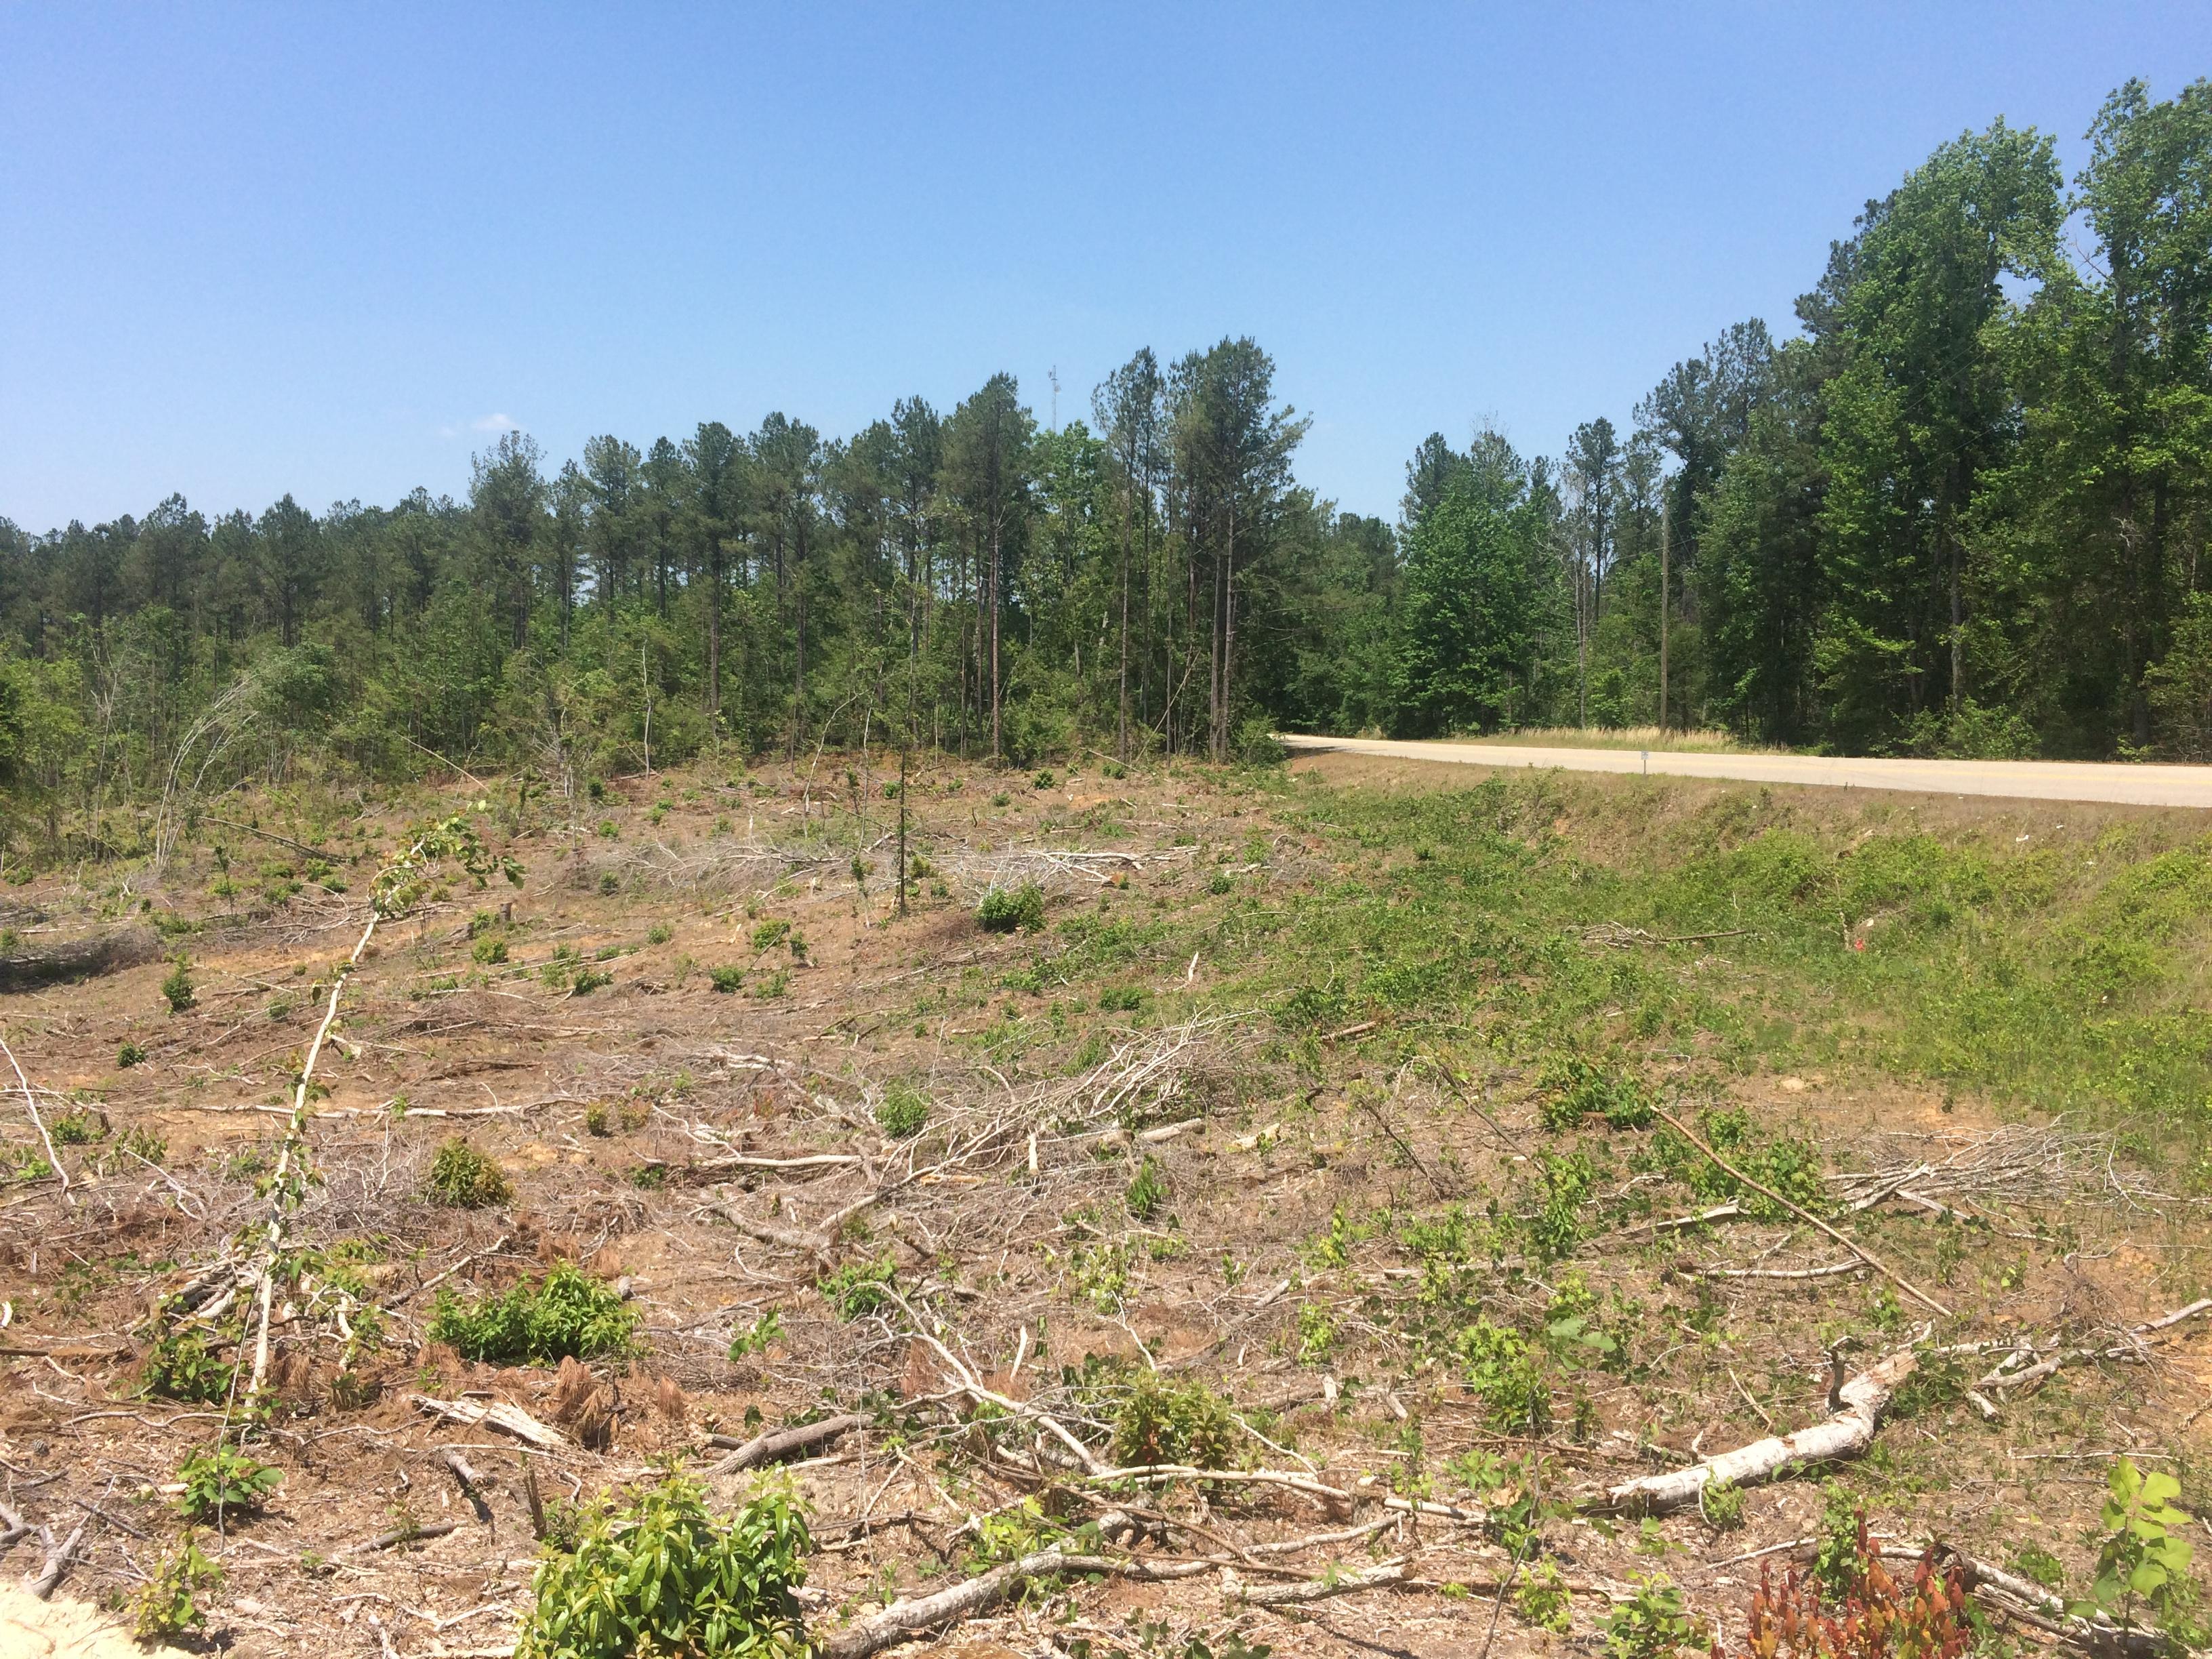 Alabama tuscaloosa county duncanville - Tuscaloosa County Mormon Road 71 Acres Under Contract